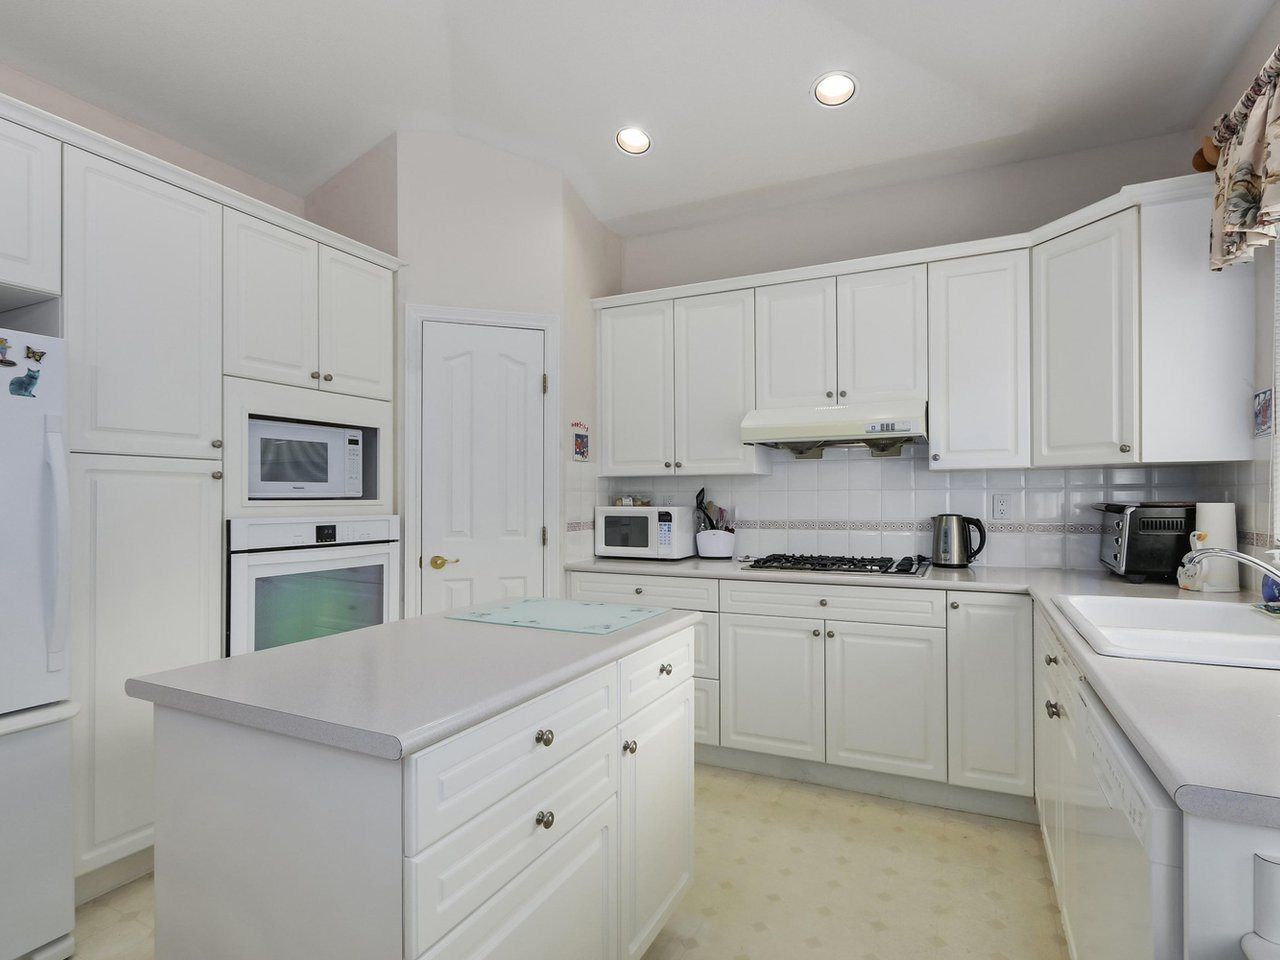 "Photo 5: Photos: 20 14888 24 Avenue in Surrey: Sunnyside Park Surrey Townhouse for sale in ""Meridian Park Estates"" (South Surrey White Rock)  : MLS®# R2296023"